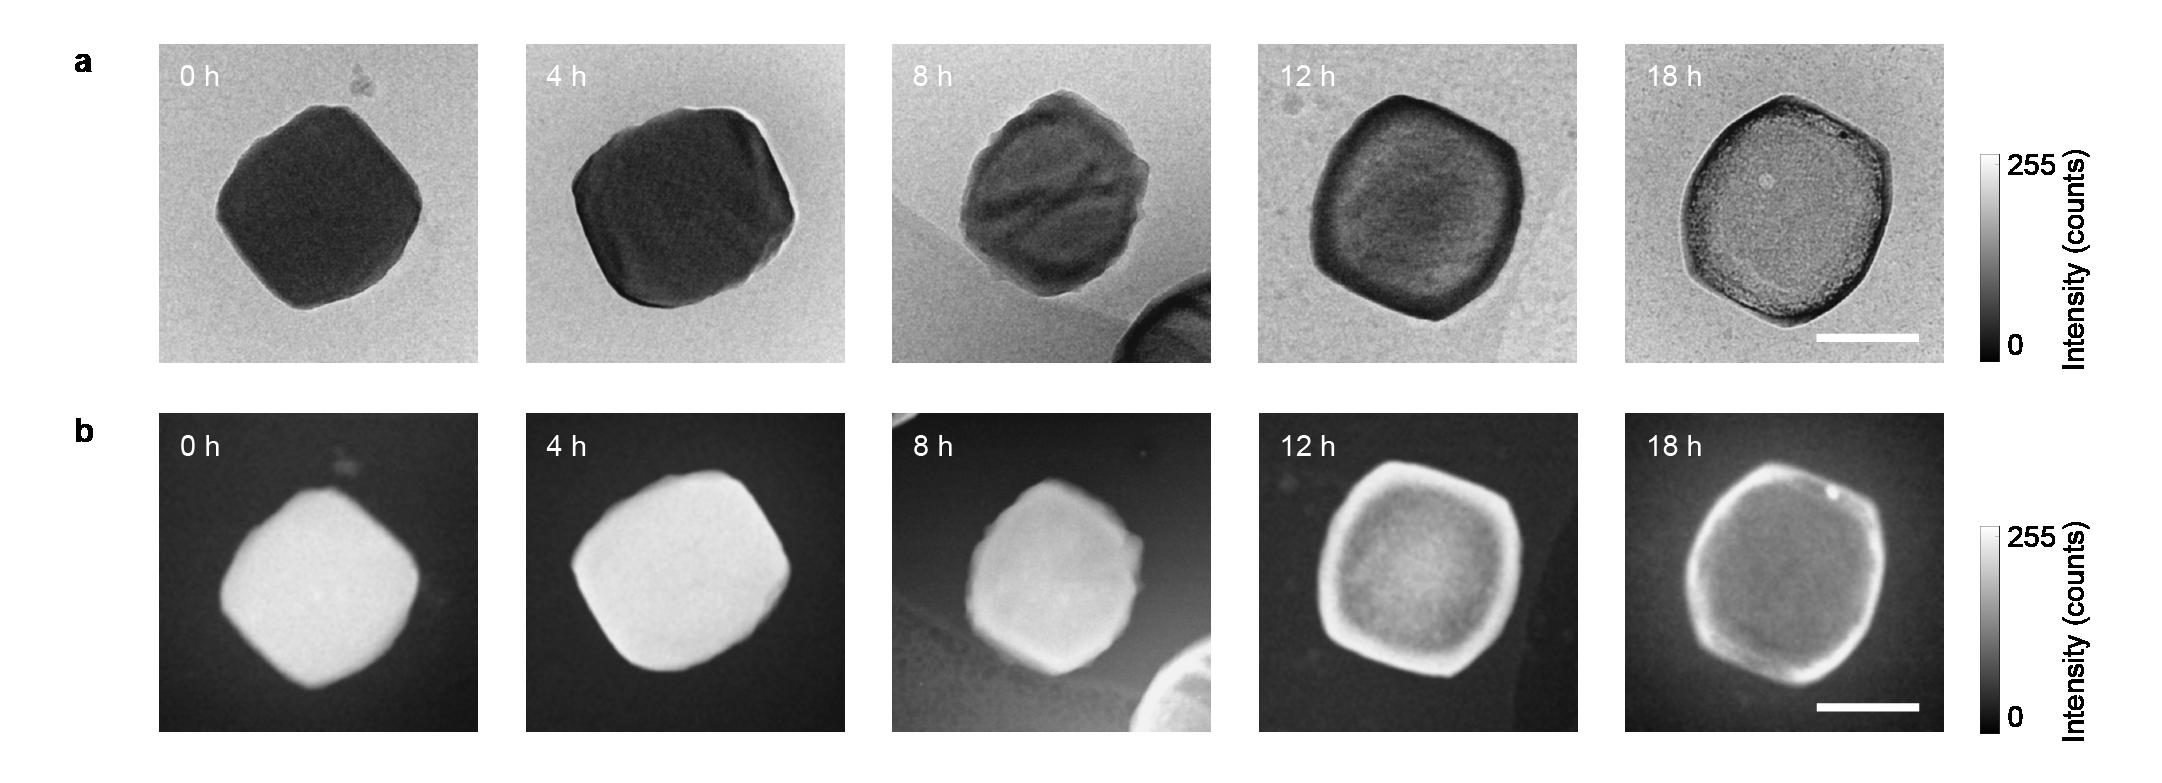 Figure 2 Hanglong article